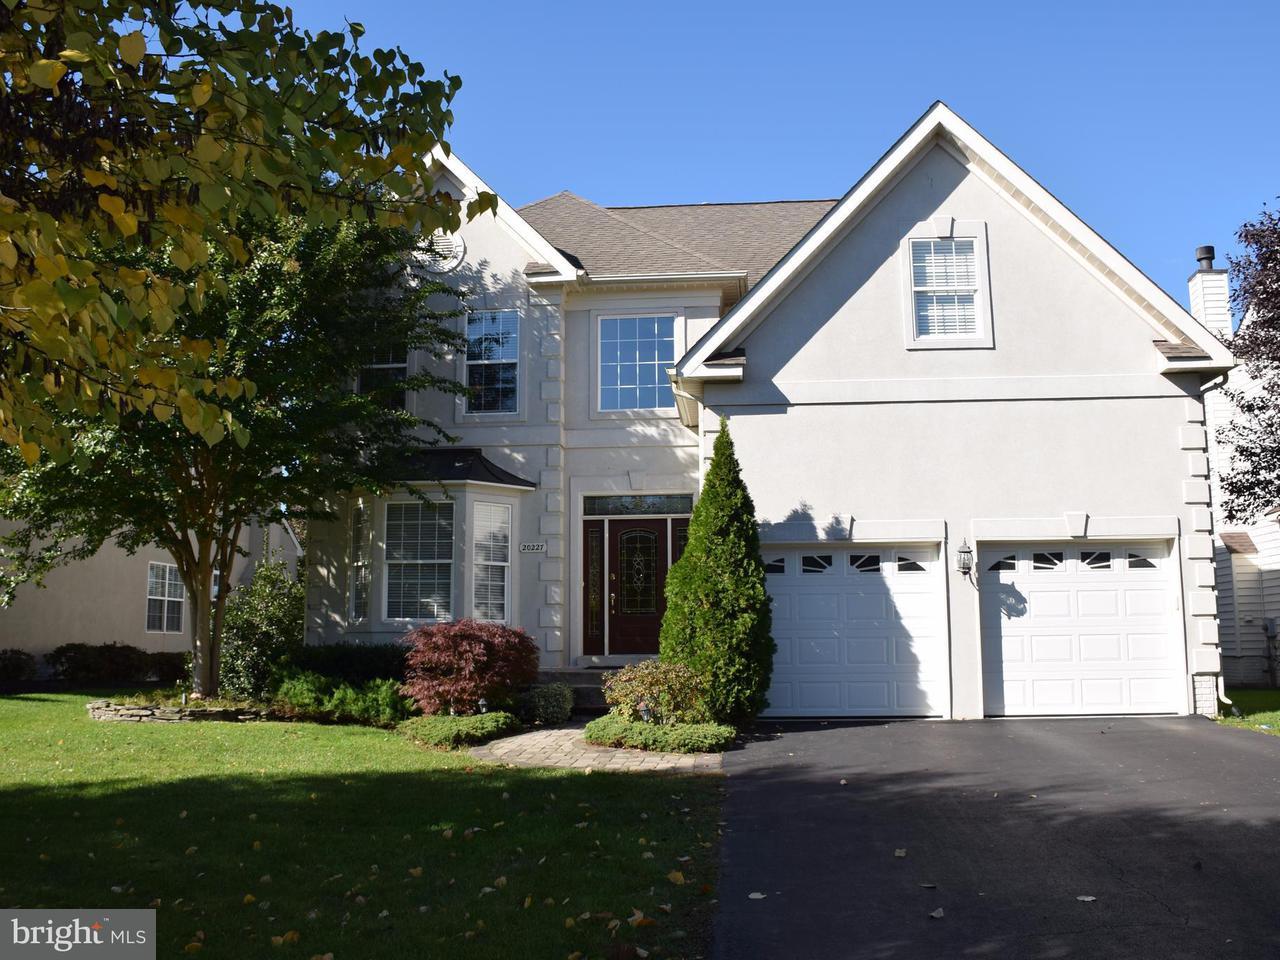 Single Family Home for Sale at 20227 HIDDEN CREEK Court 20227 HIDDEN CREEK Court Ashburn, Virginia 20147 United States